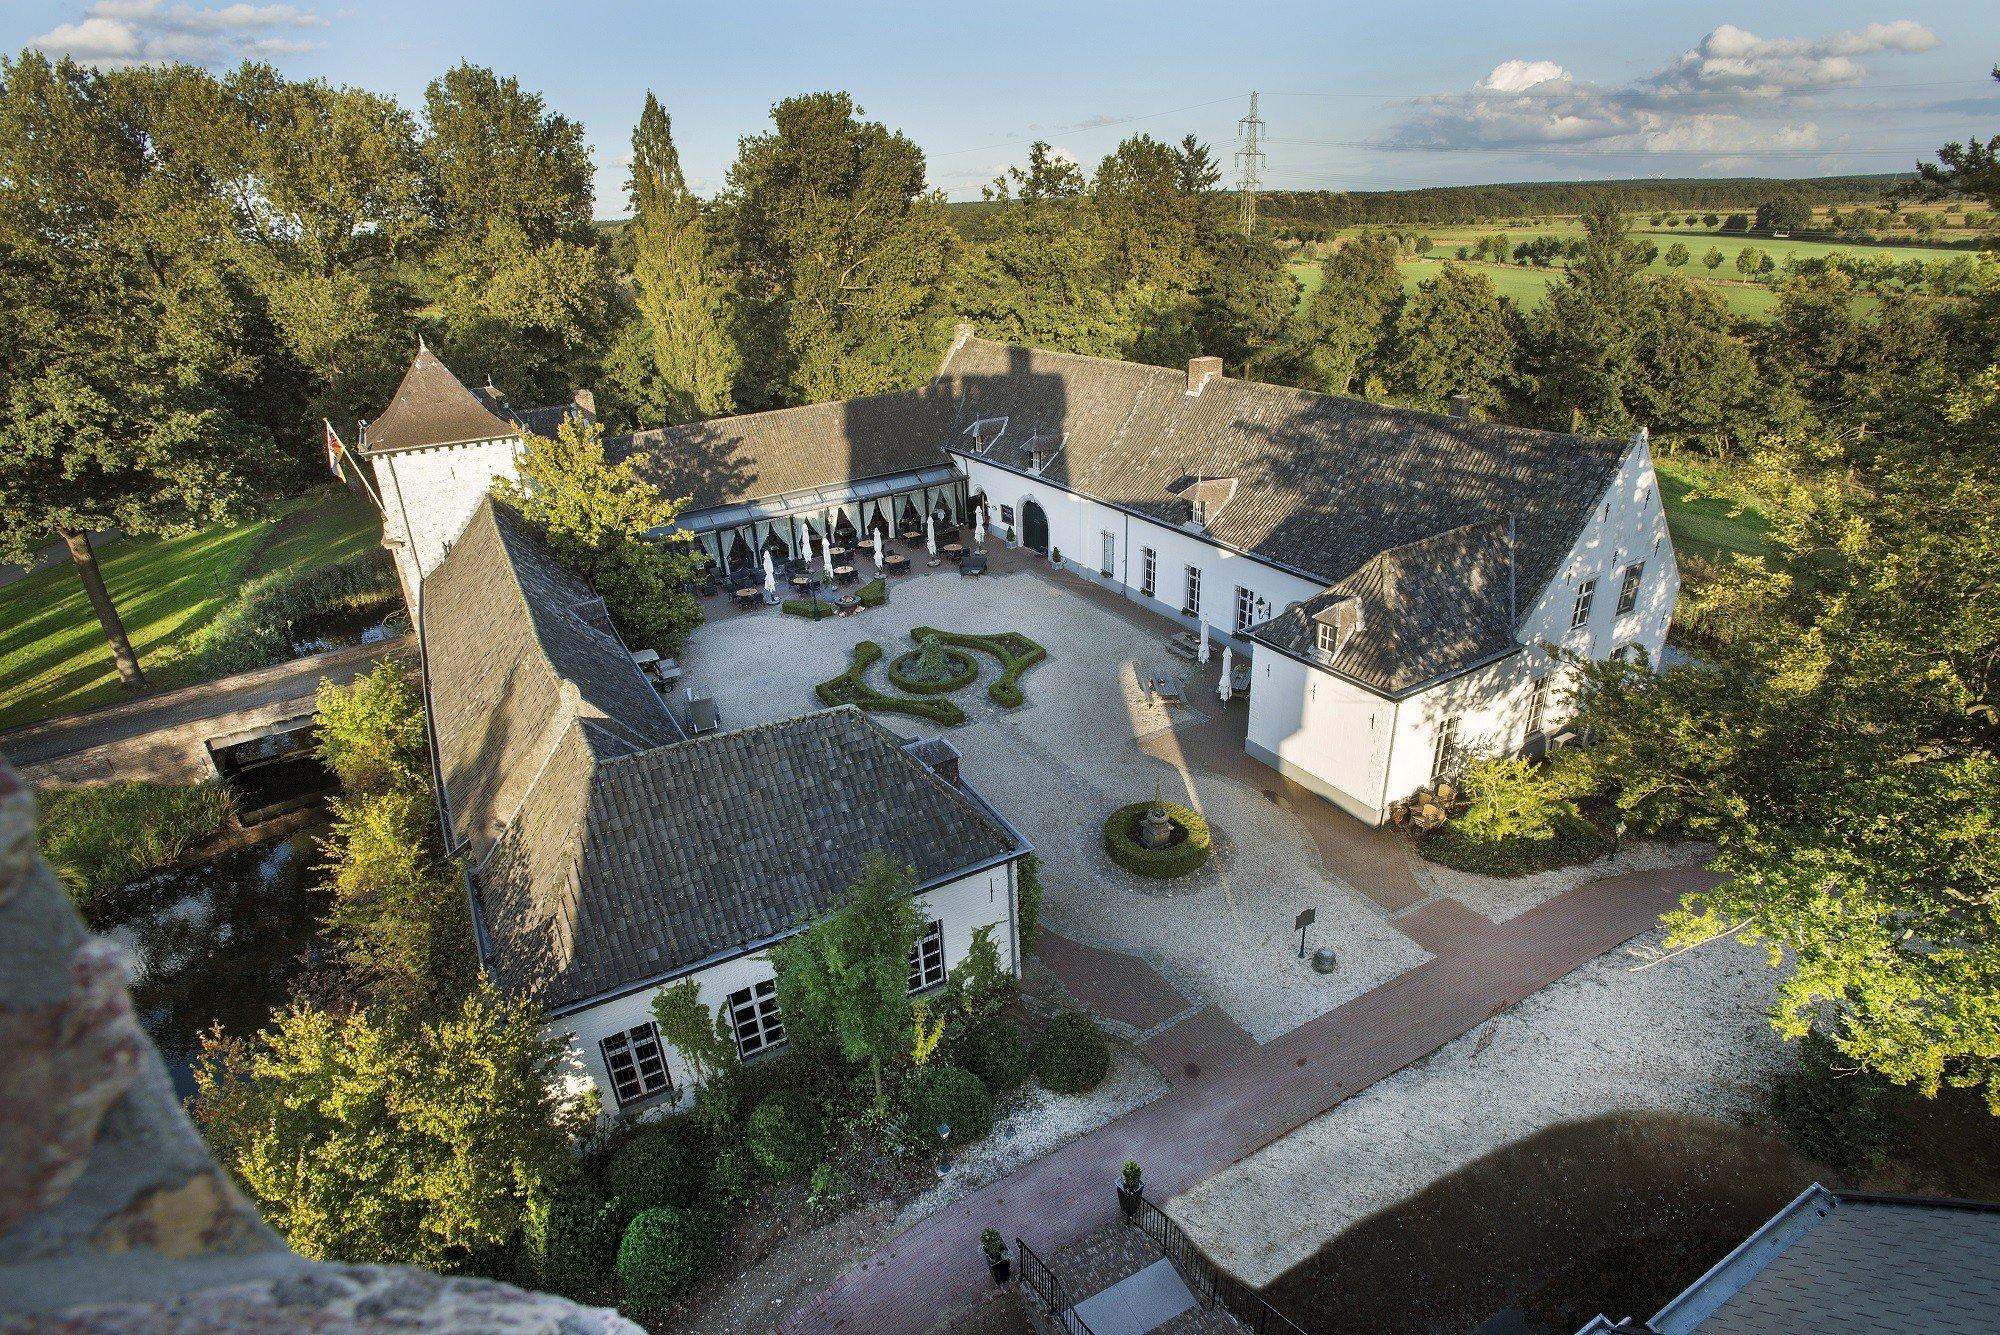 Geniet 3 dagen in het <b> Limburgse </b> 4*-kasteelhotel incl. diner